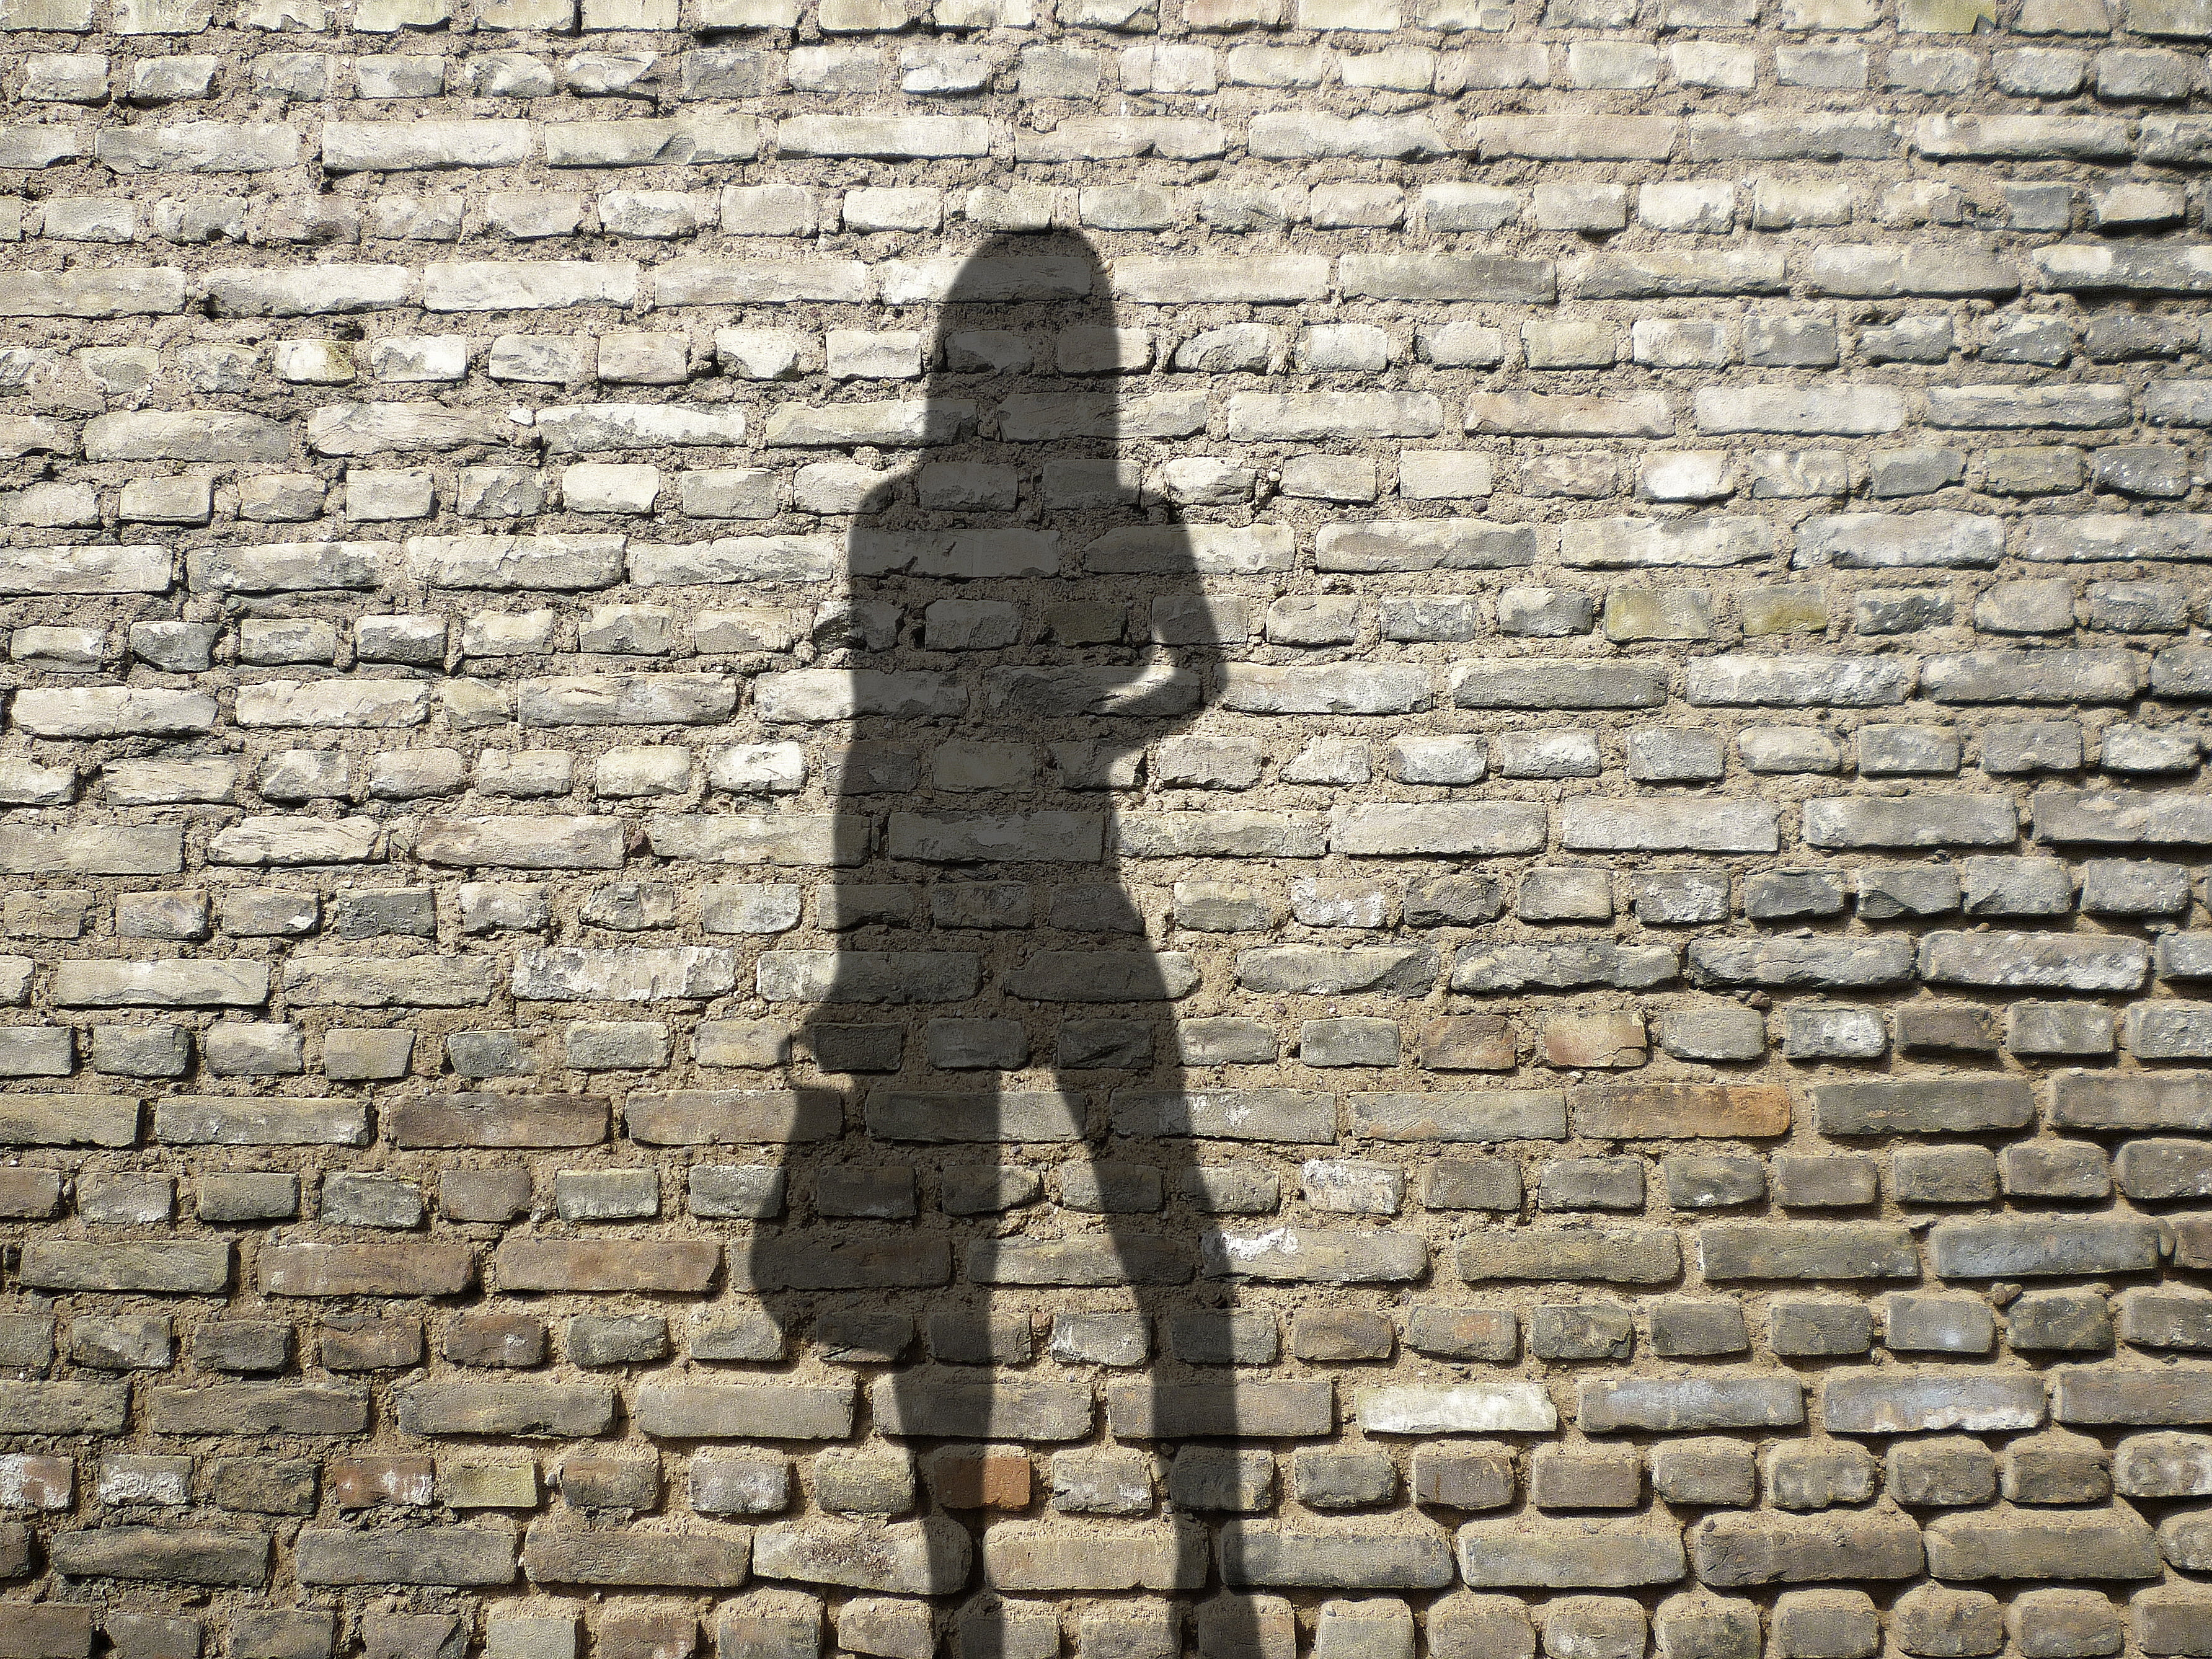 silhoKansas City Prostitution Lawyeruette of woman